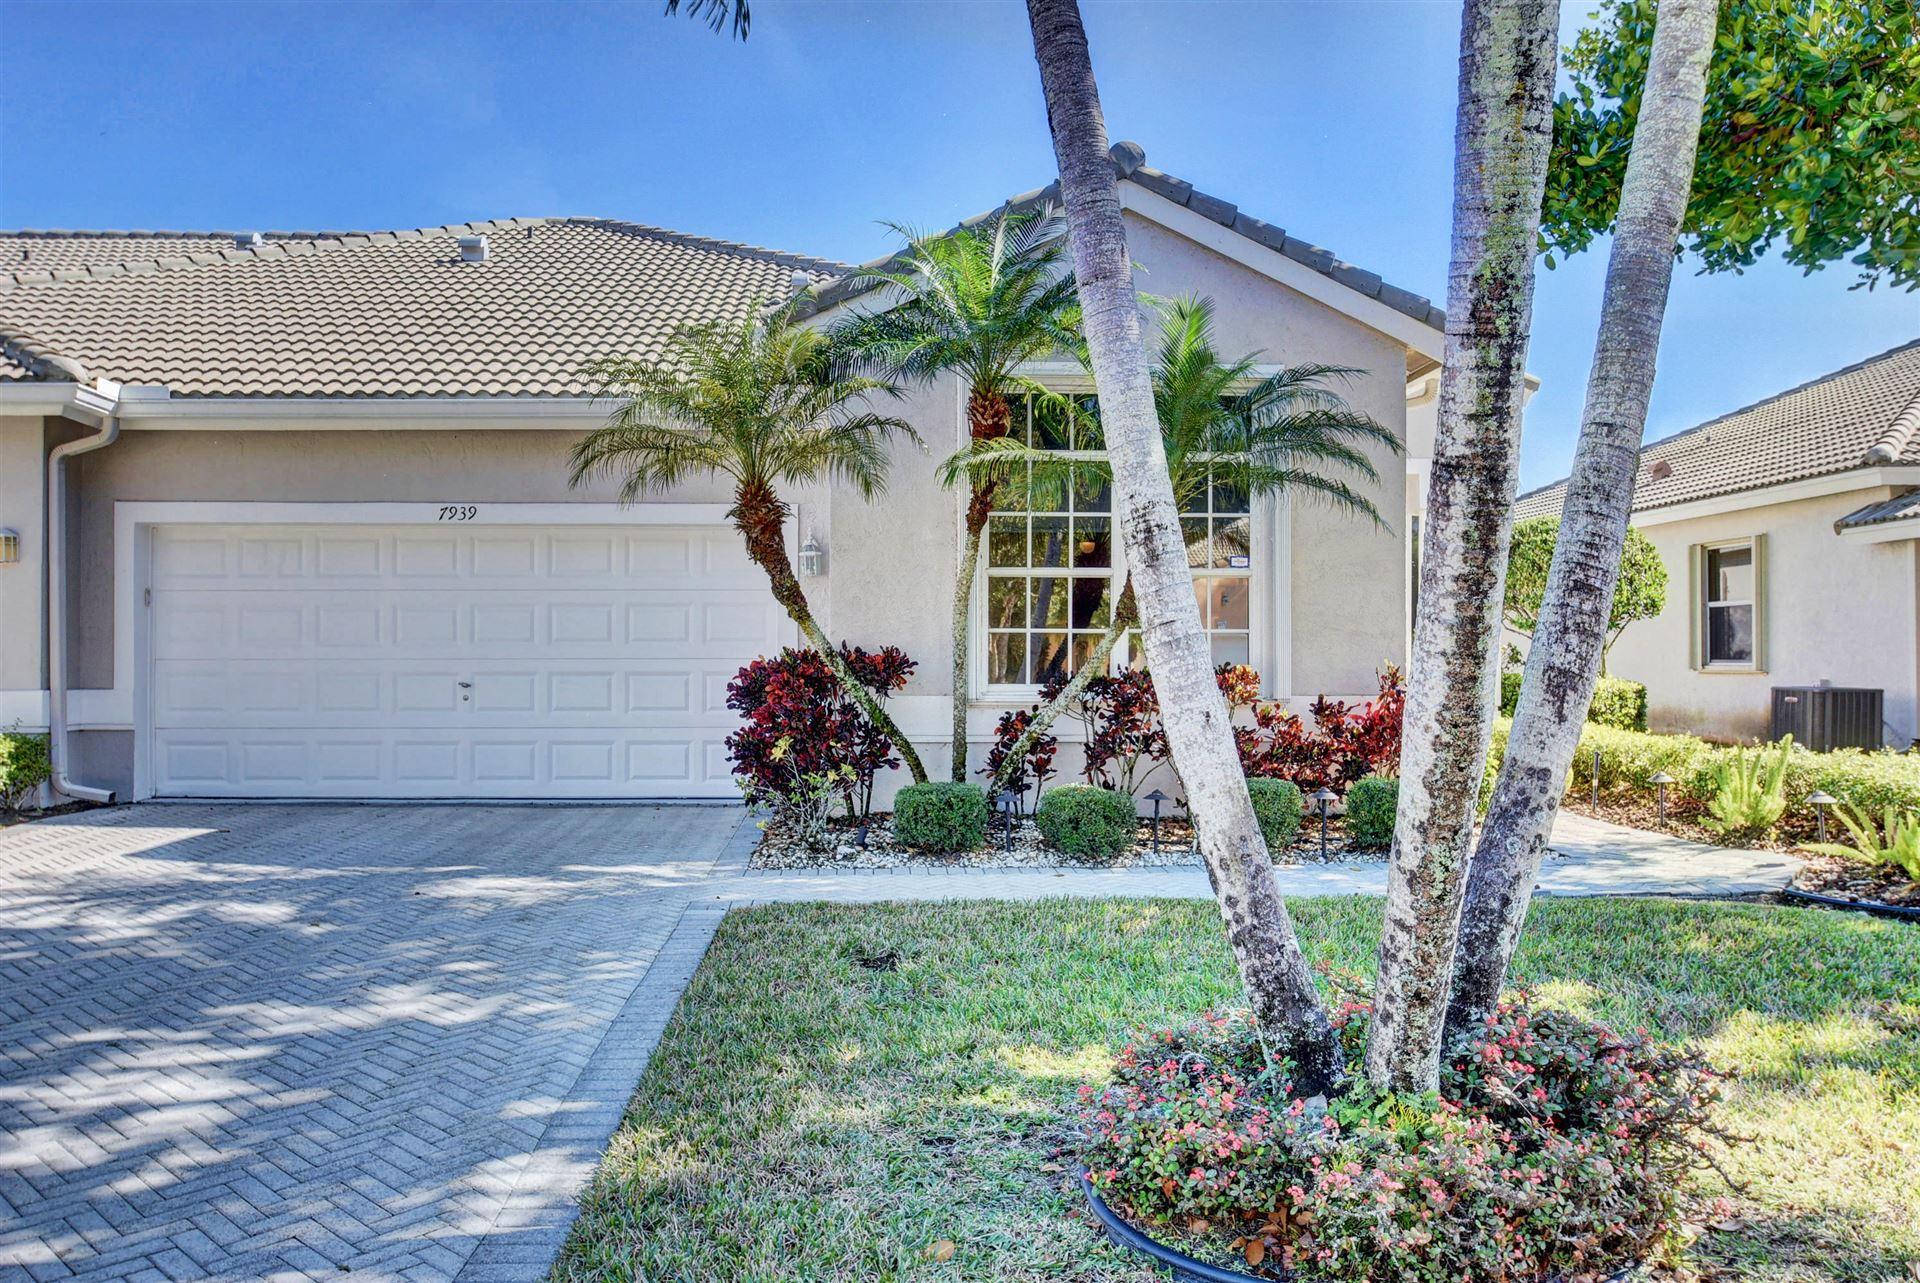 7939 Rockford Road, Boynton Beach, FL 33472 - #: RX-10686018